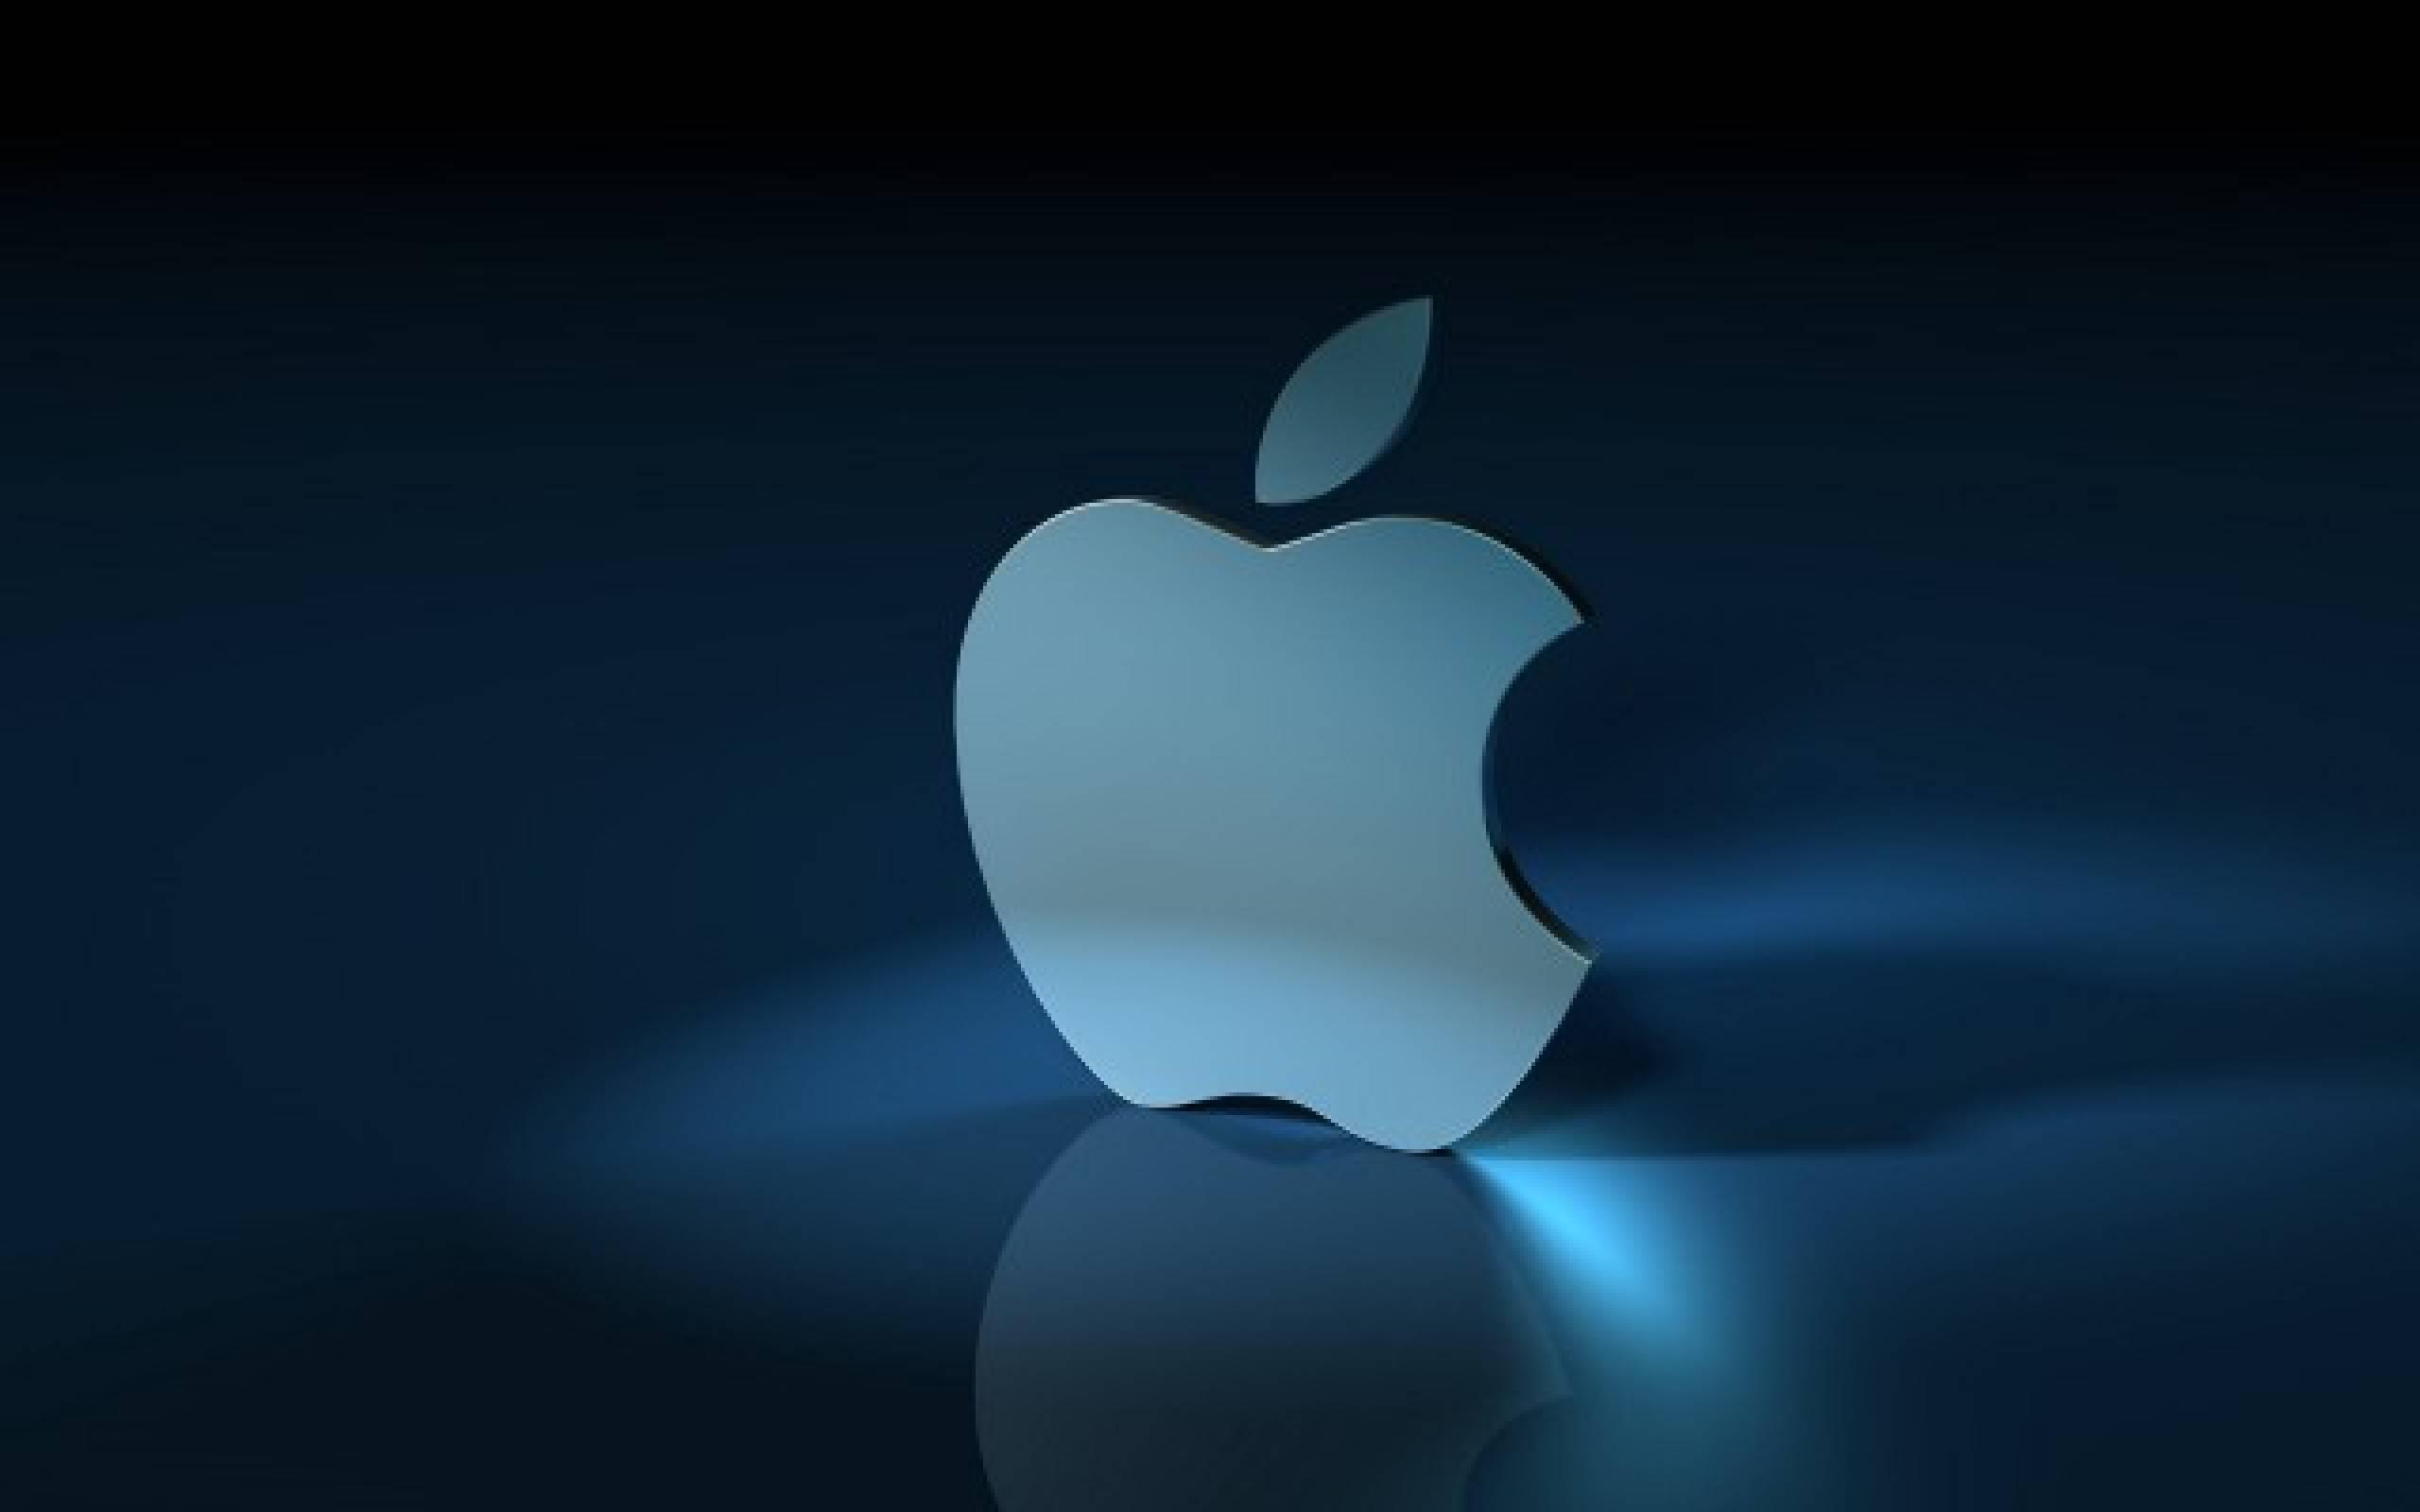 3D Apple Logo